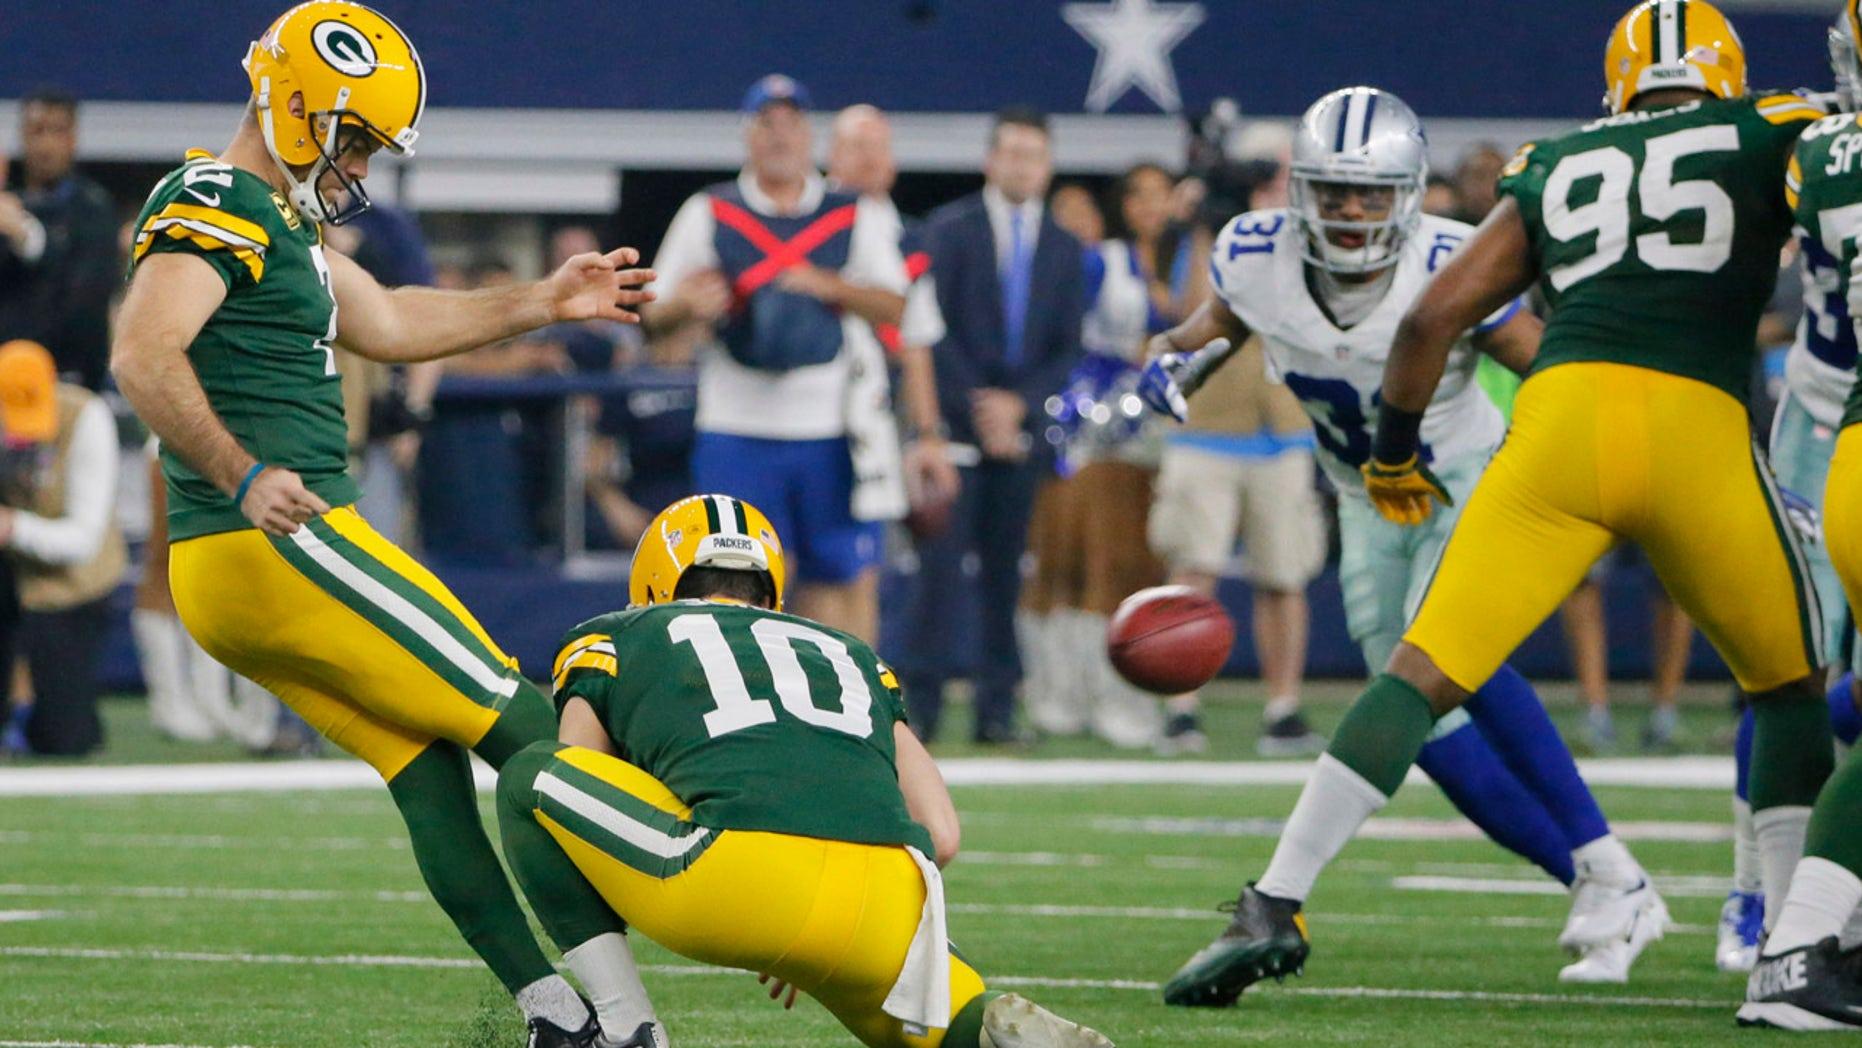 Jan. 15, 2017: Green Bay Packers kicker Mason Crosby (2) kicks a 56-yard field goal against the Dallas Cowboys during the second half of an NFL divisional playoff football game in Arlington, Texas